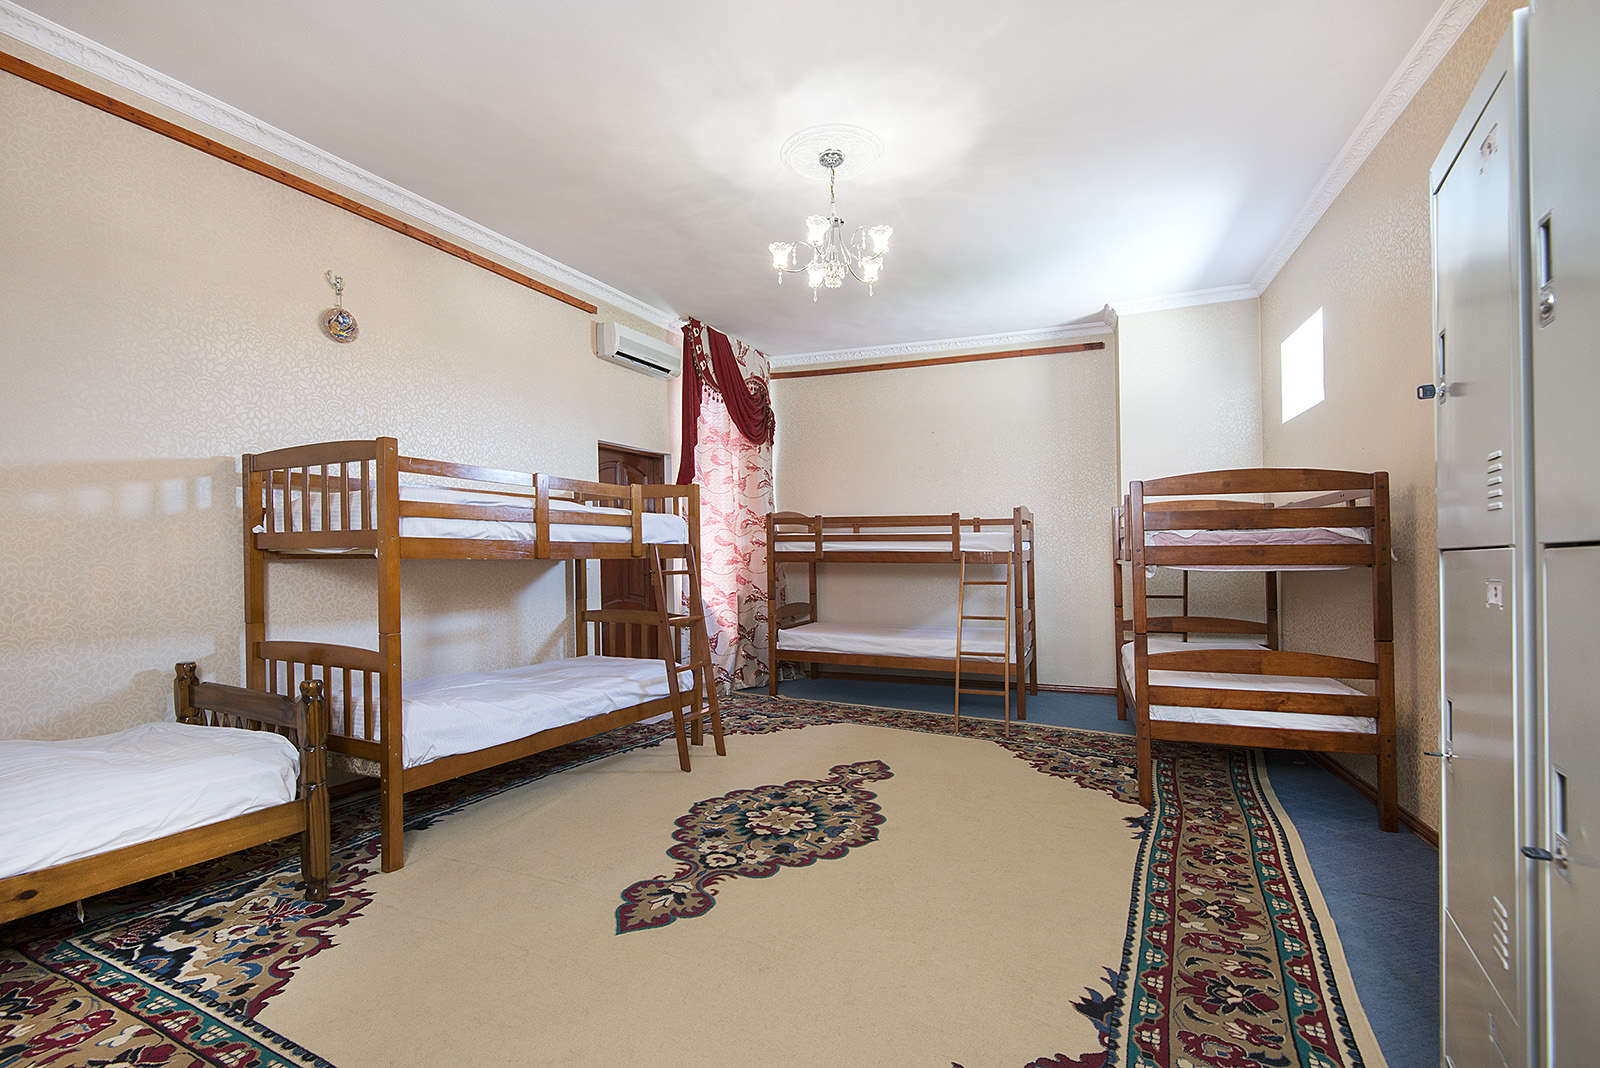 7 Bed Dorm